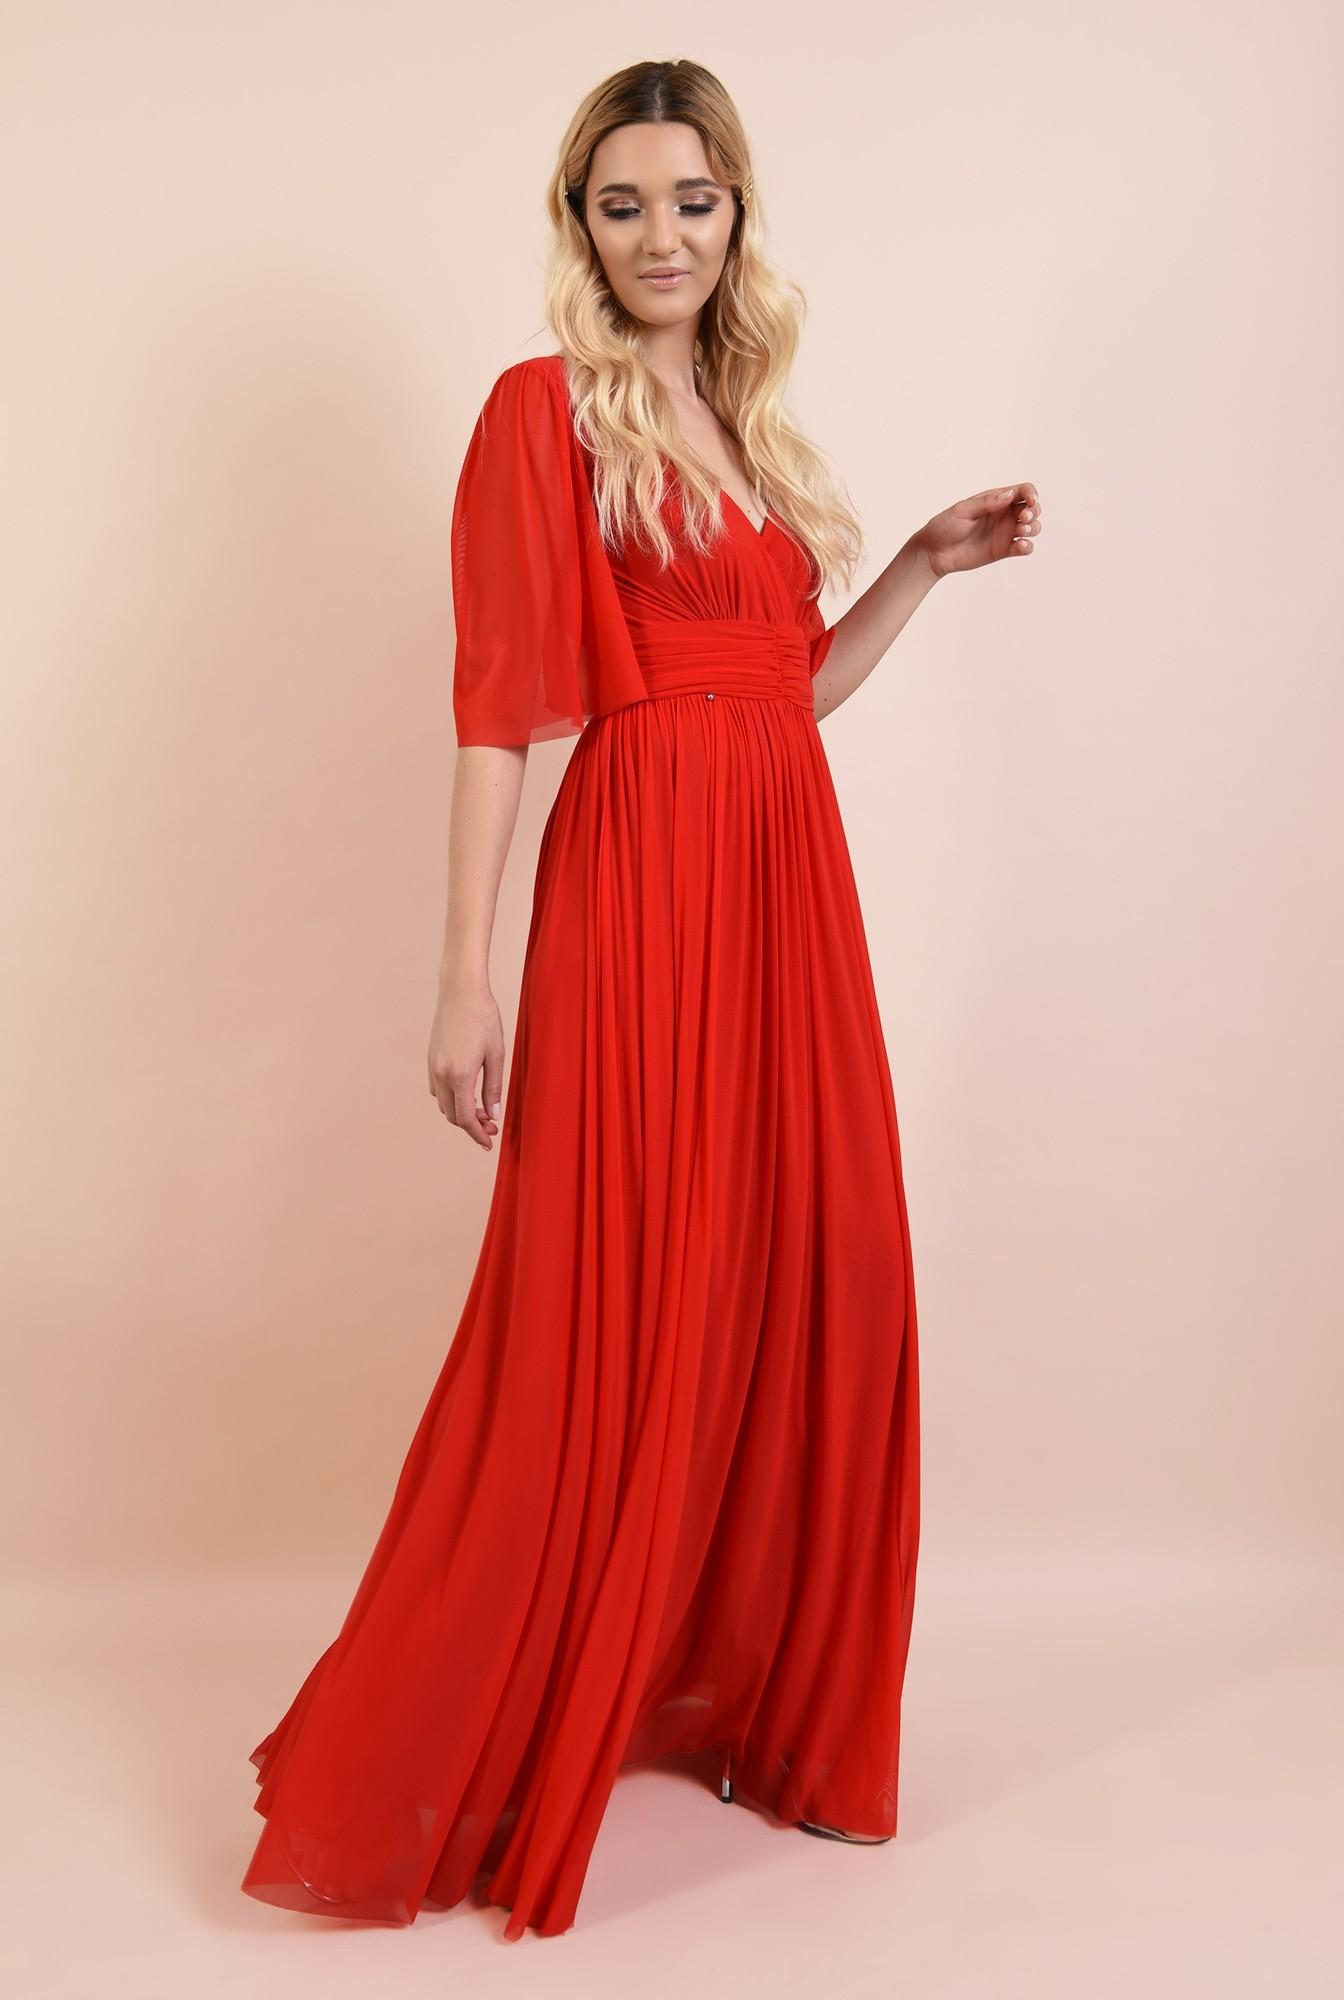 3 - rochie rosie, lunga, de seara, anchior, evazata, maneci fluture, Poema